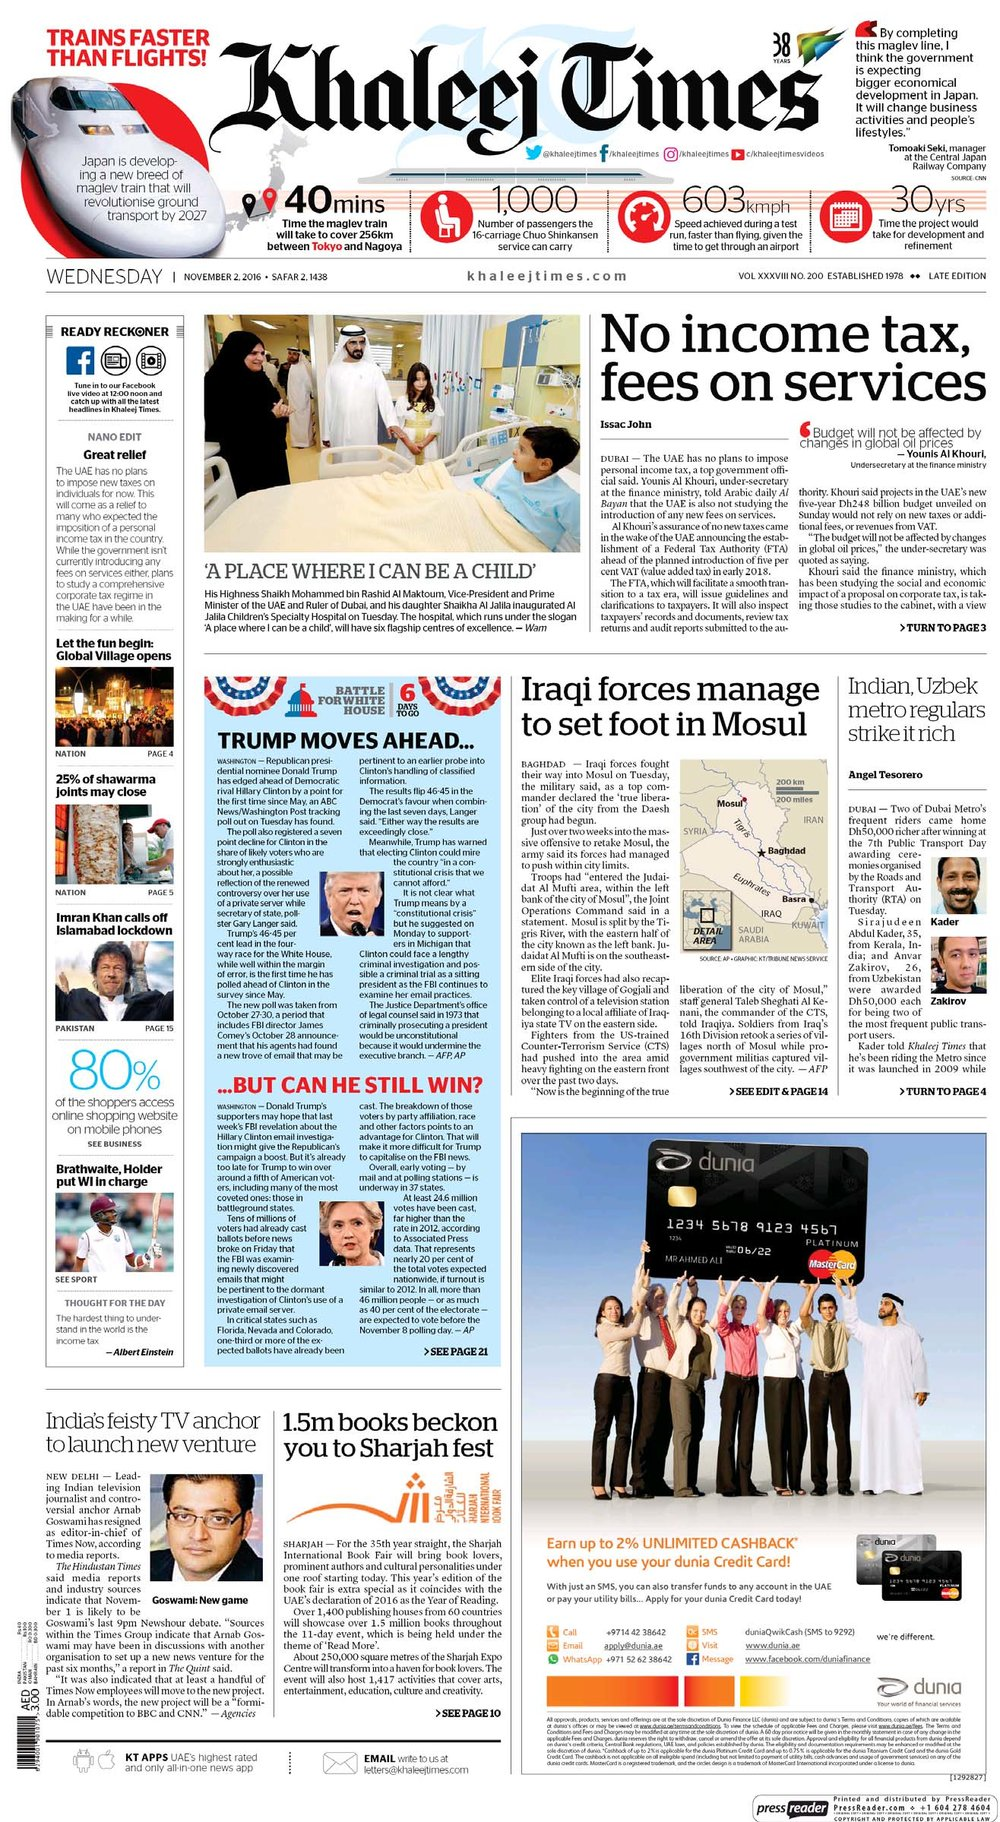 2016.11.02.KhaleejTimes_Page_1_Image_0001.jpg